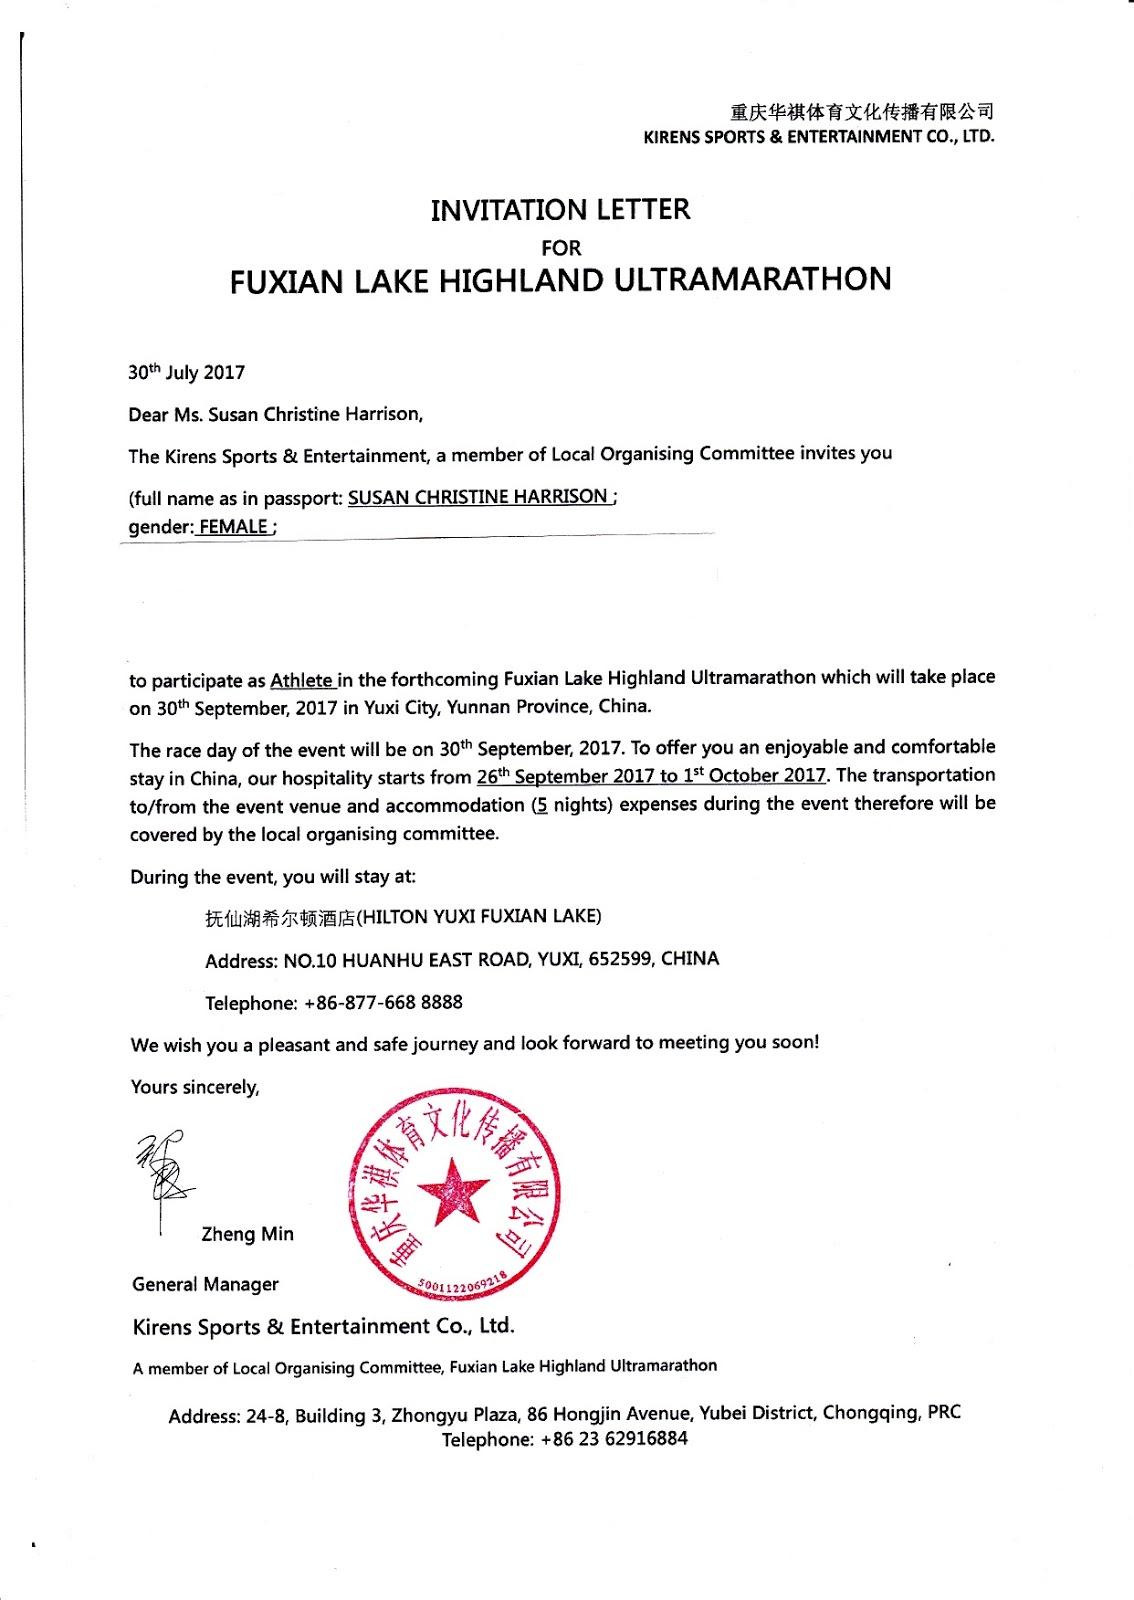 my invitation letter